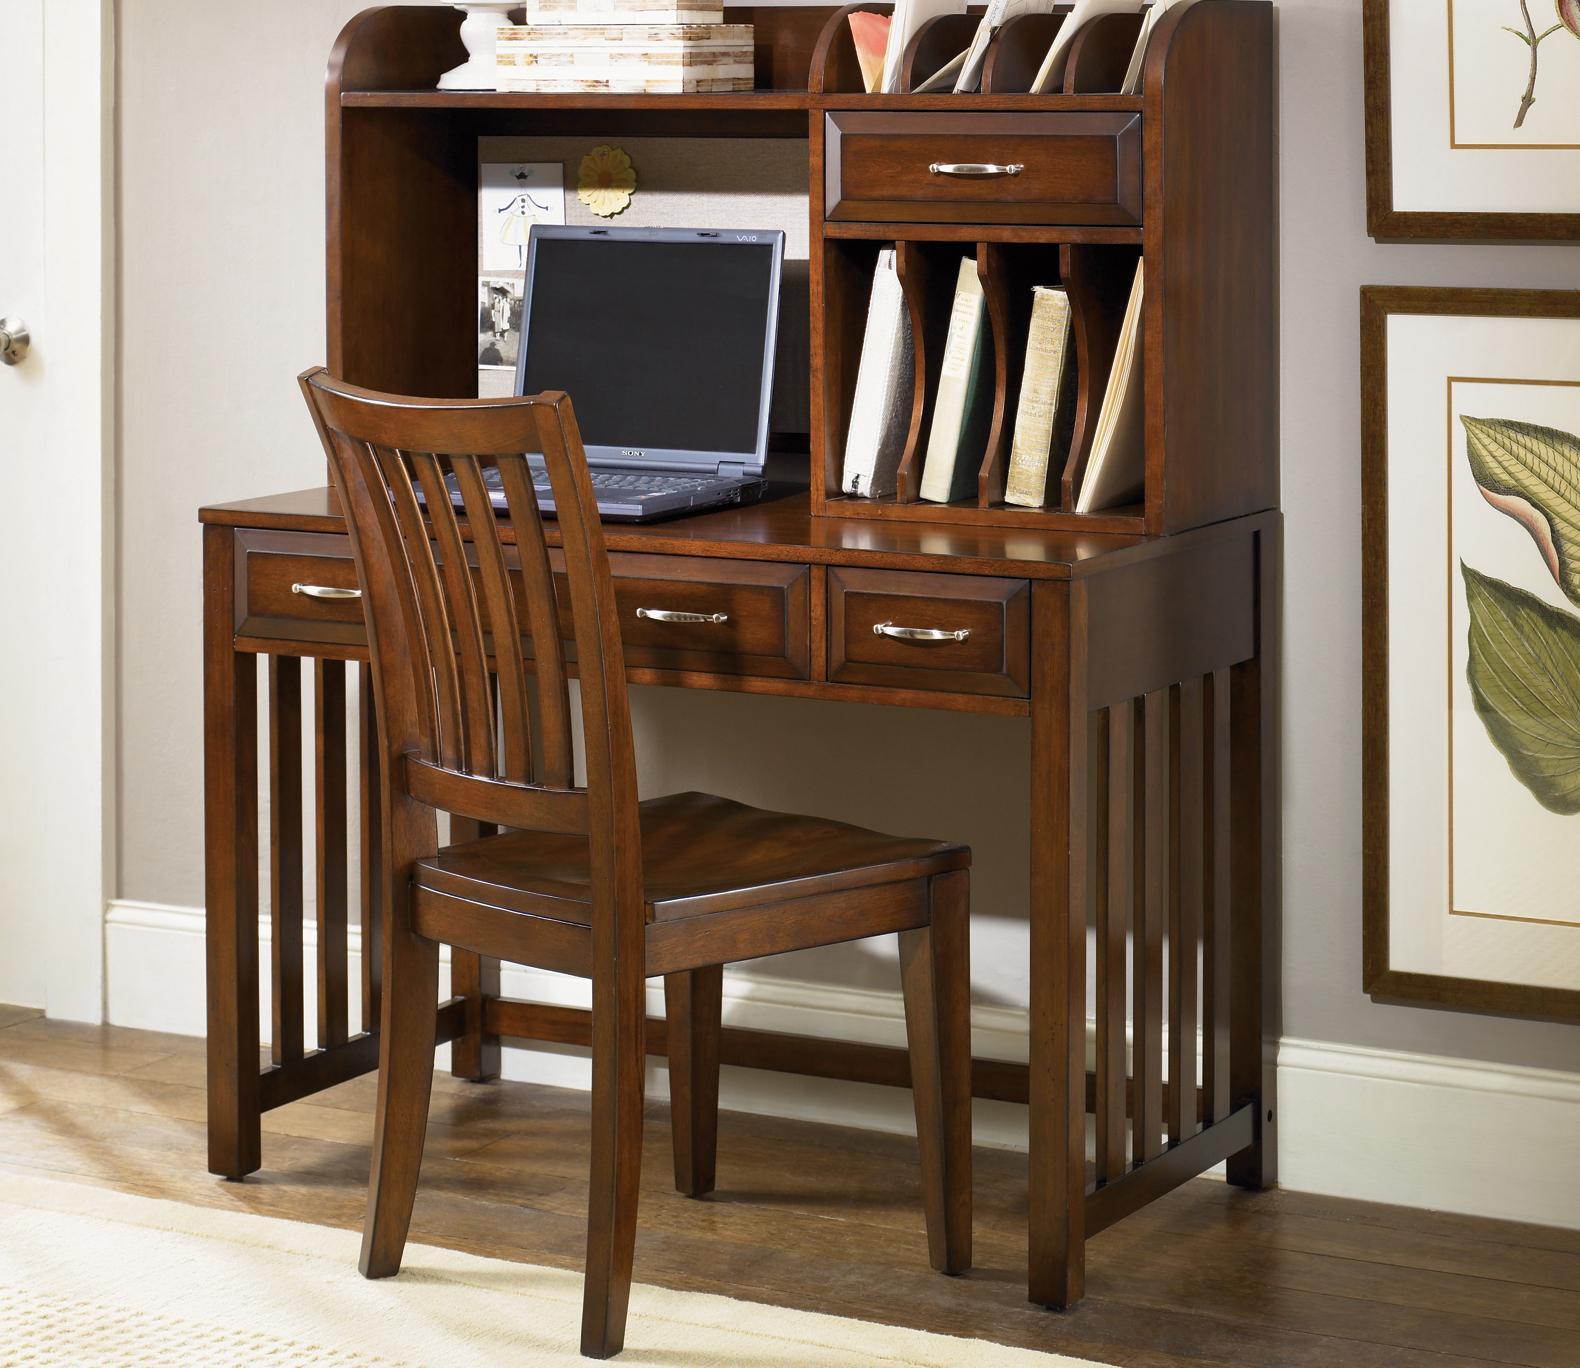 Hampton Bay  Writing Desk and Hutch by Liberty Furniture at Lapeer Furniture & Mattress Center